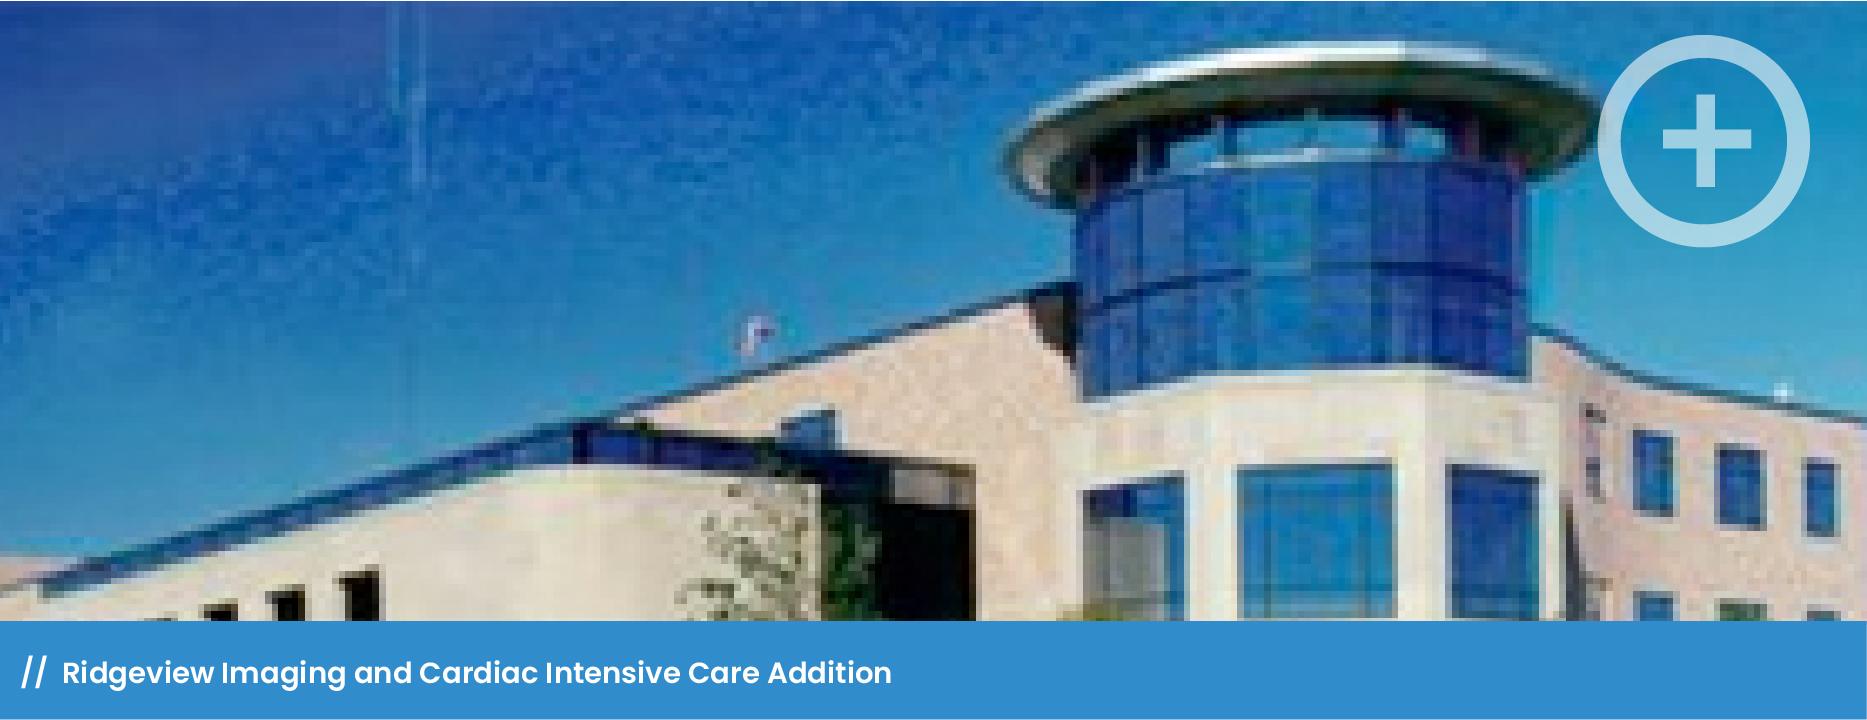 Yanik-Watermark_Ridgeview Imaging and Cardiac Intensive Care Addition